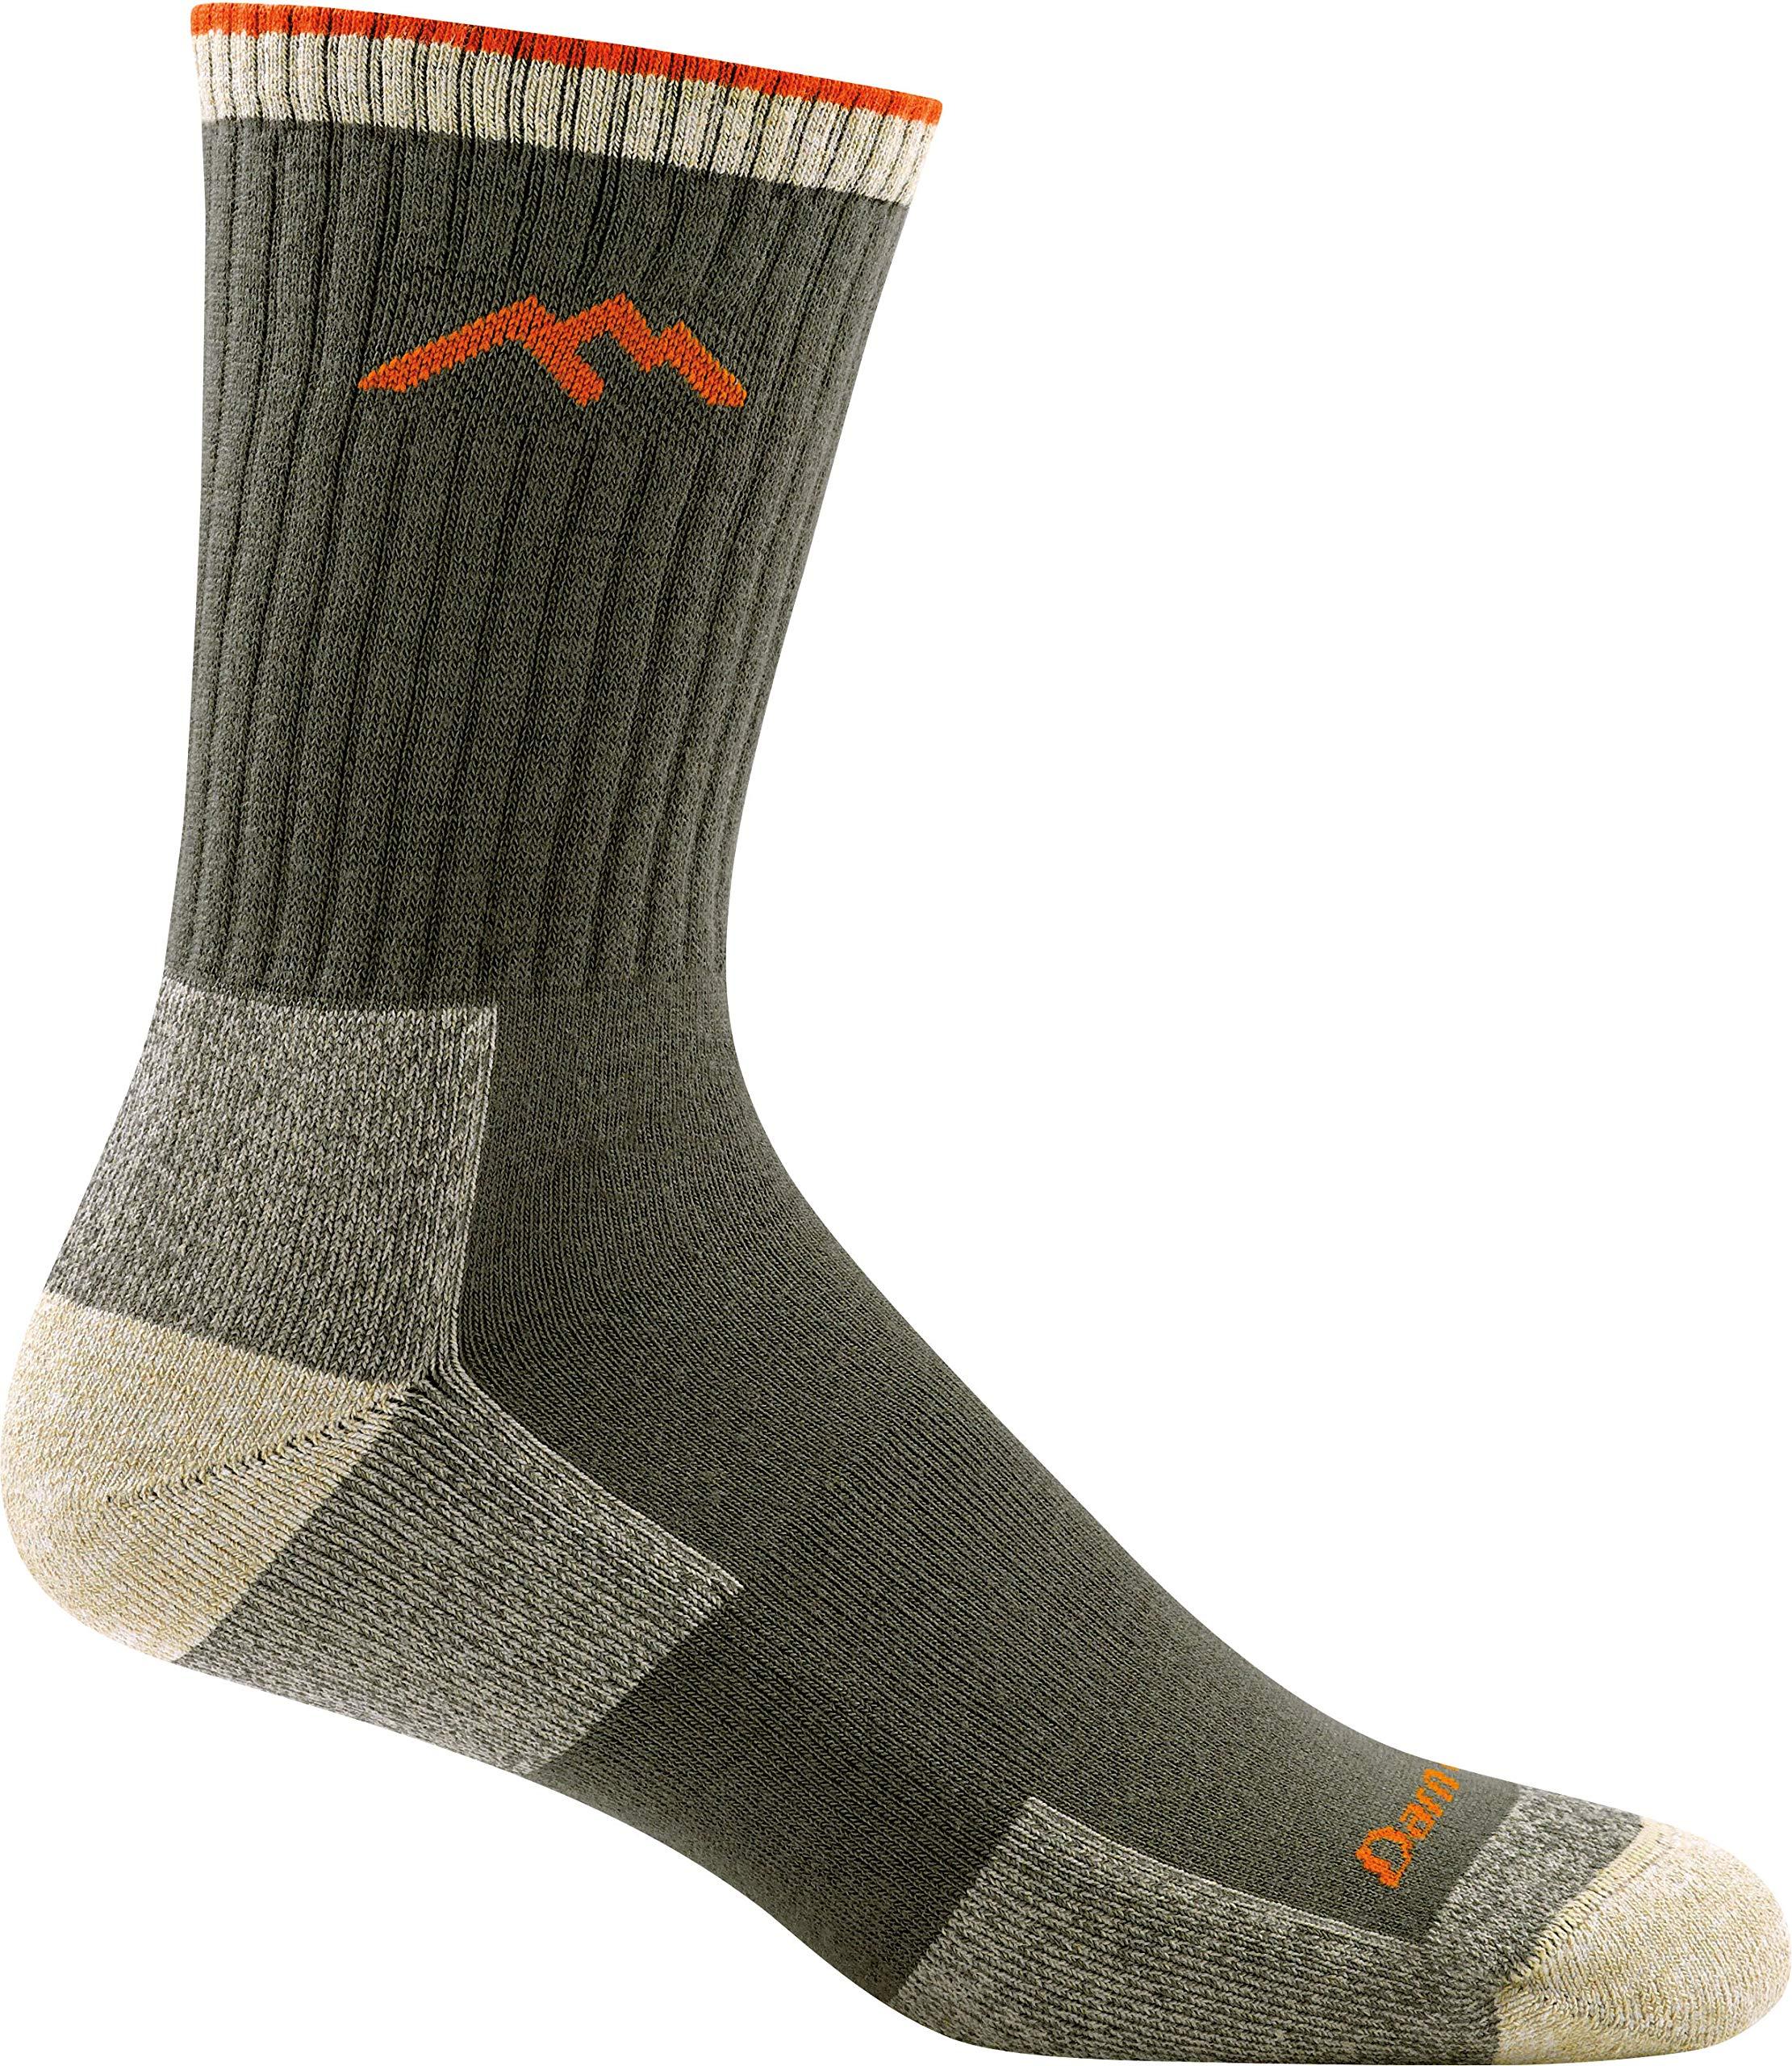 Darn Tough Coolmax Micro Crew Cushion Socks - Men's Olive Large by Darn Tough